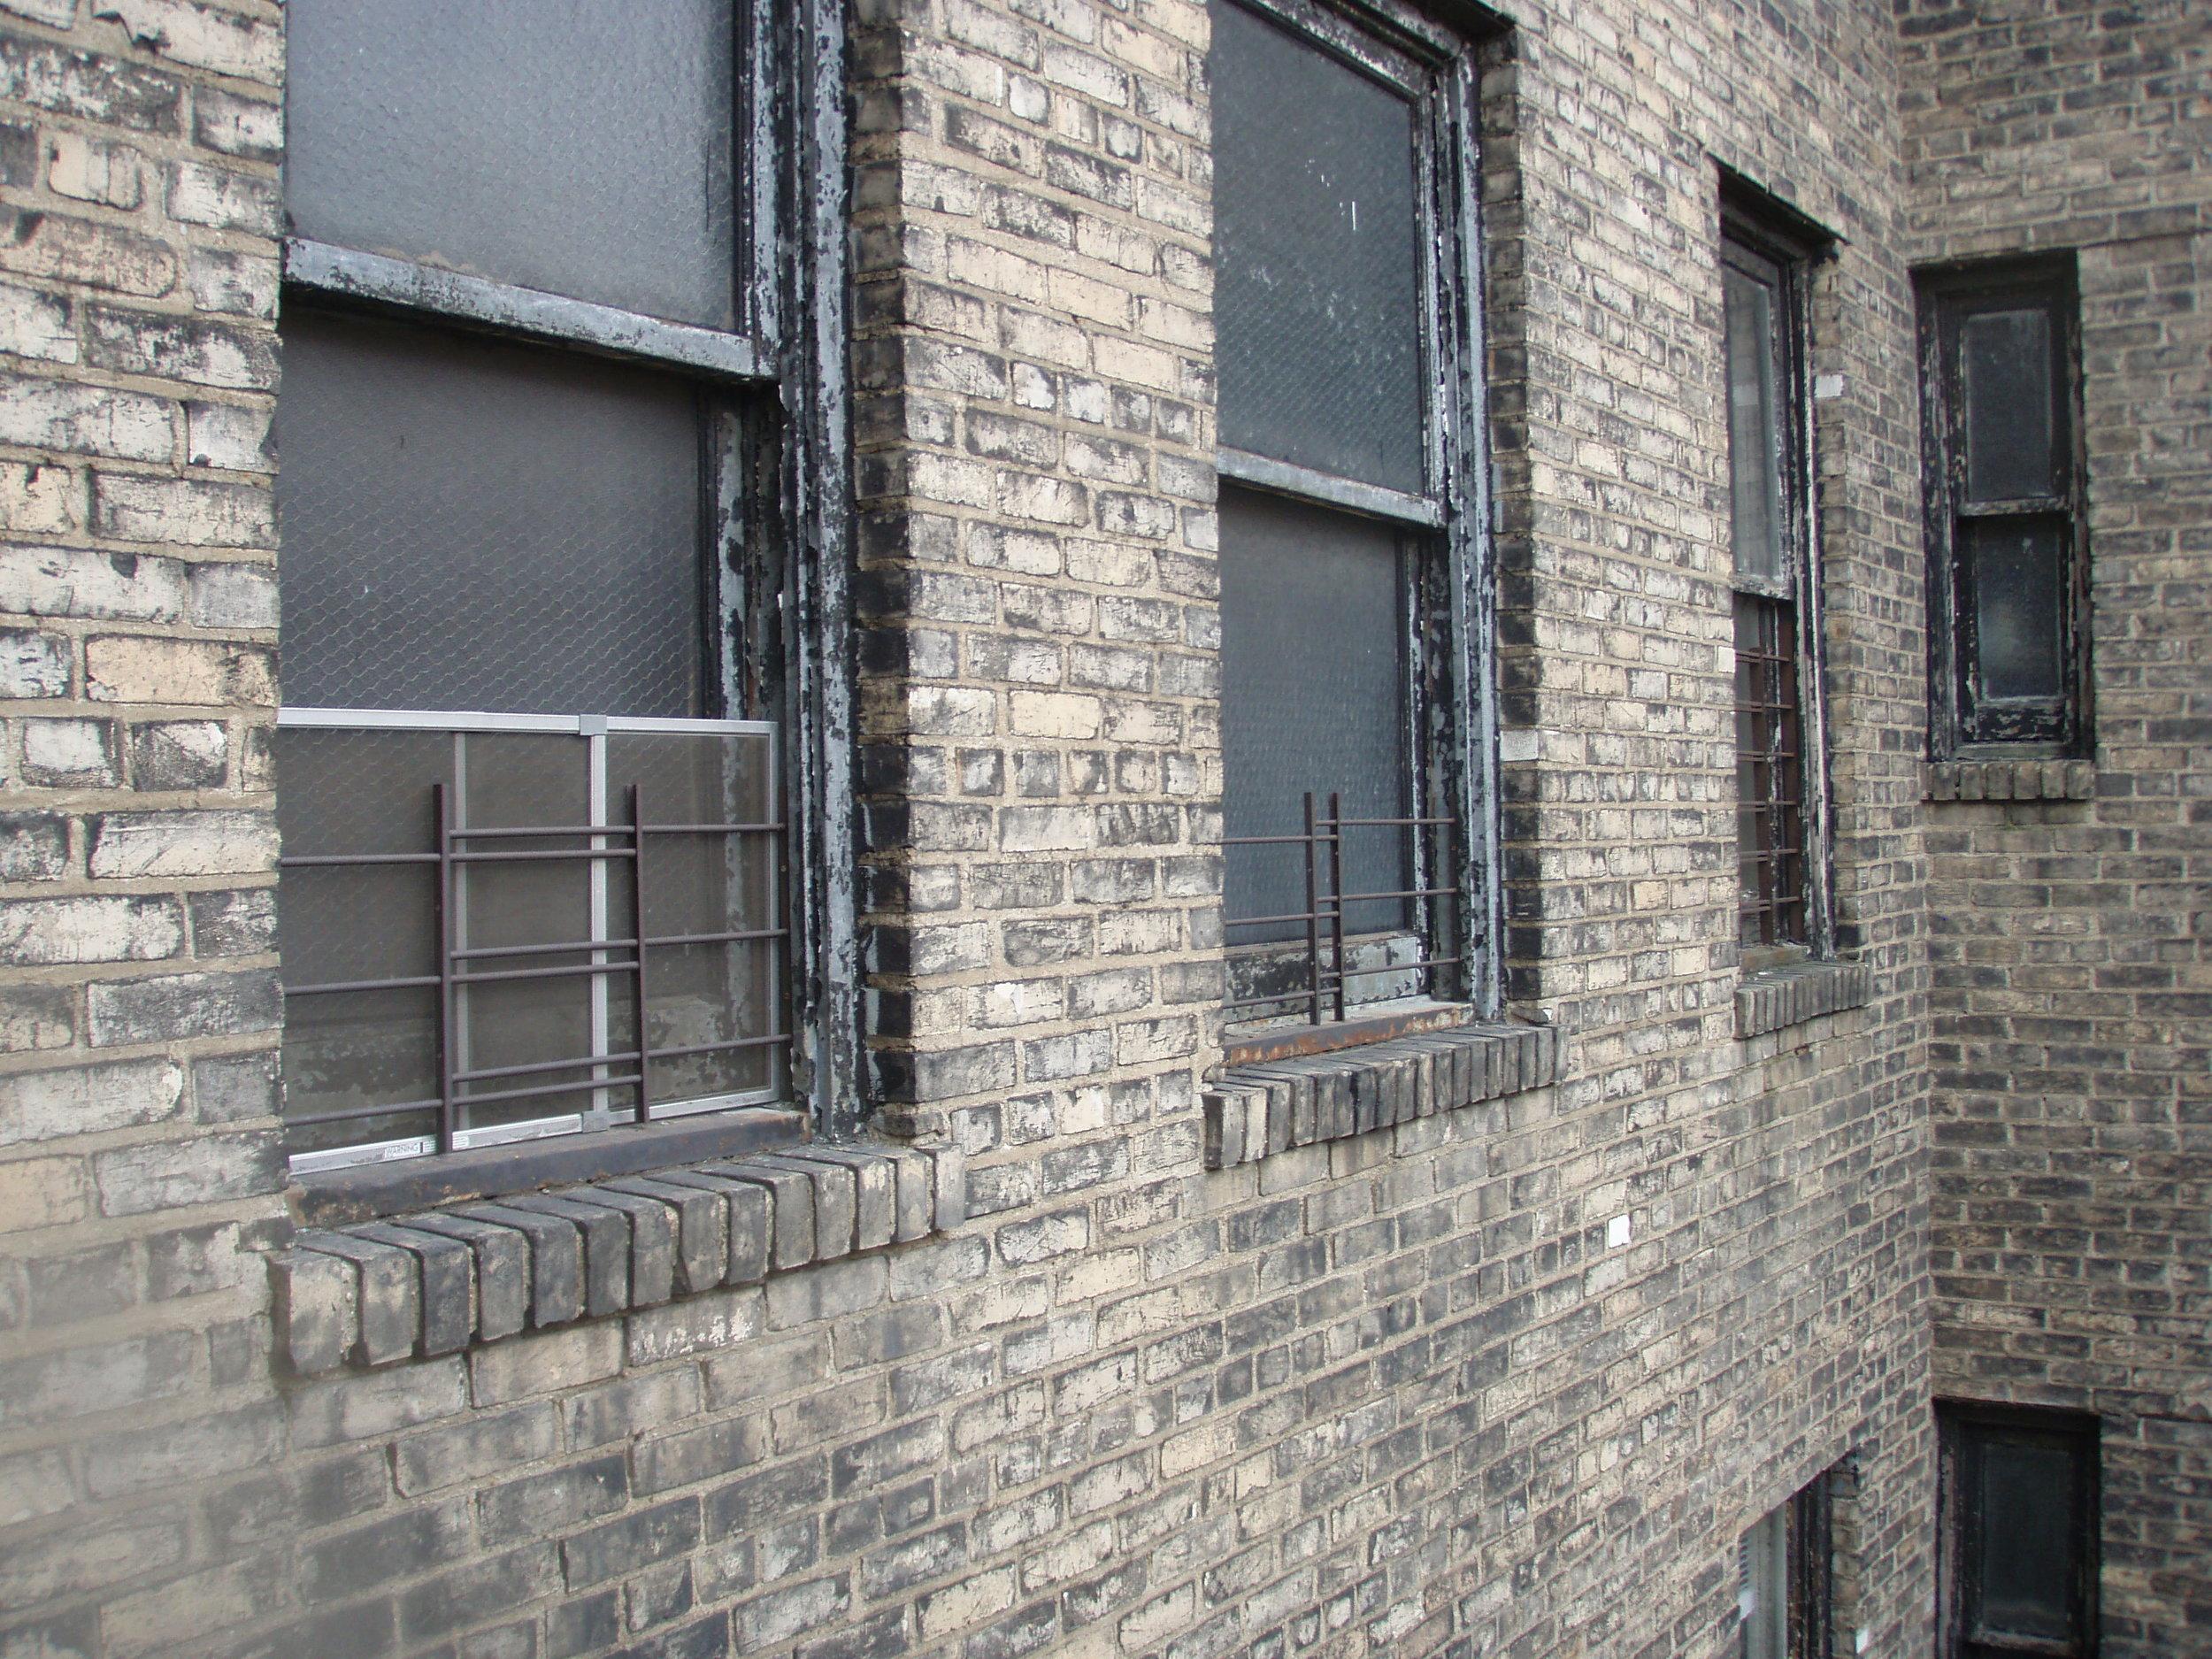 Brooklyn-Heights-windows-before-repair-LFA-Architects.JPG